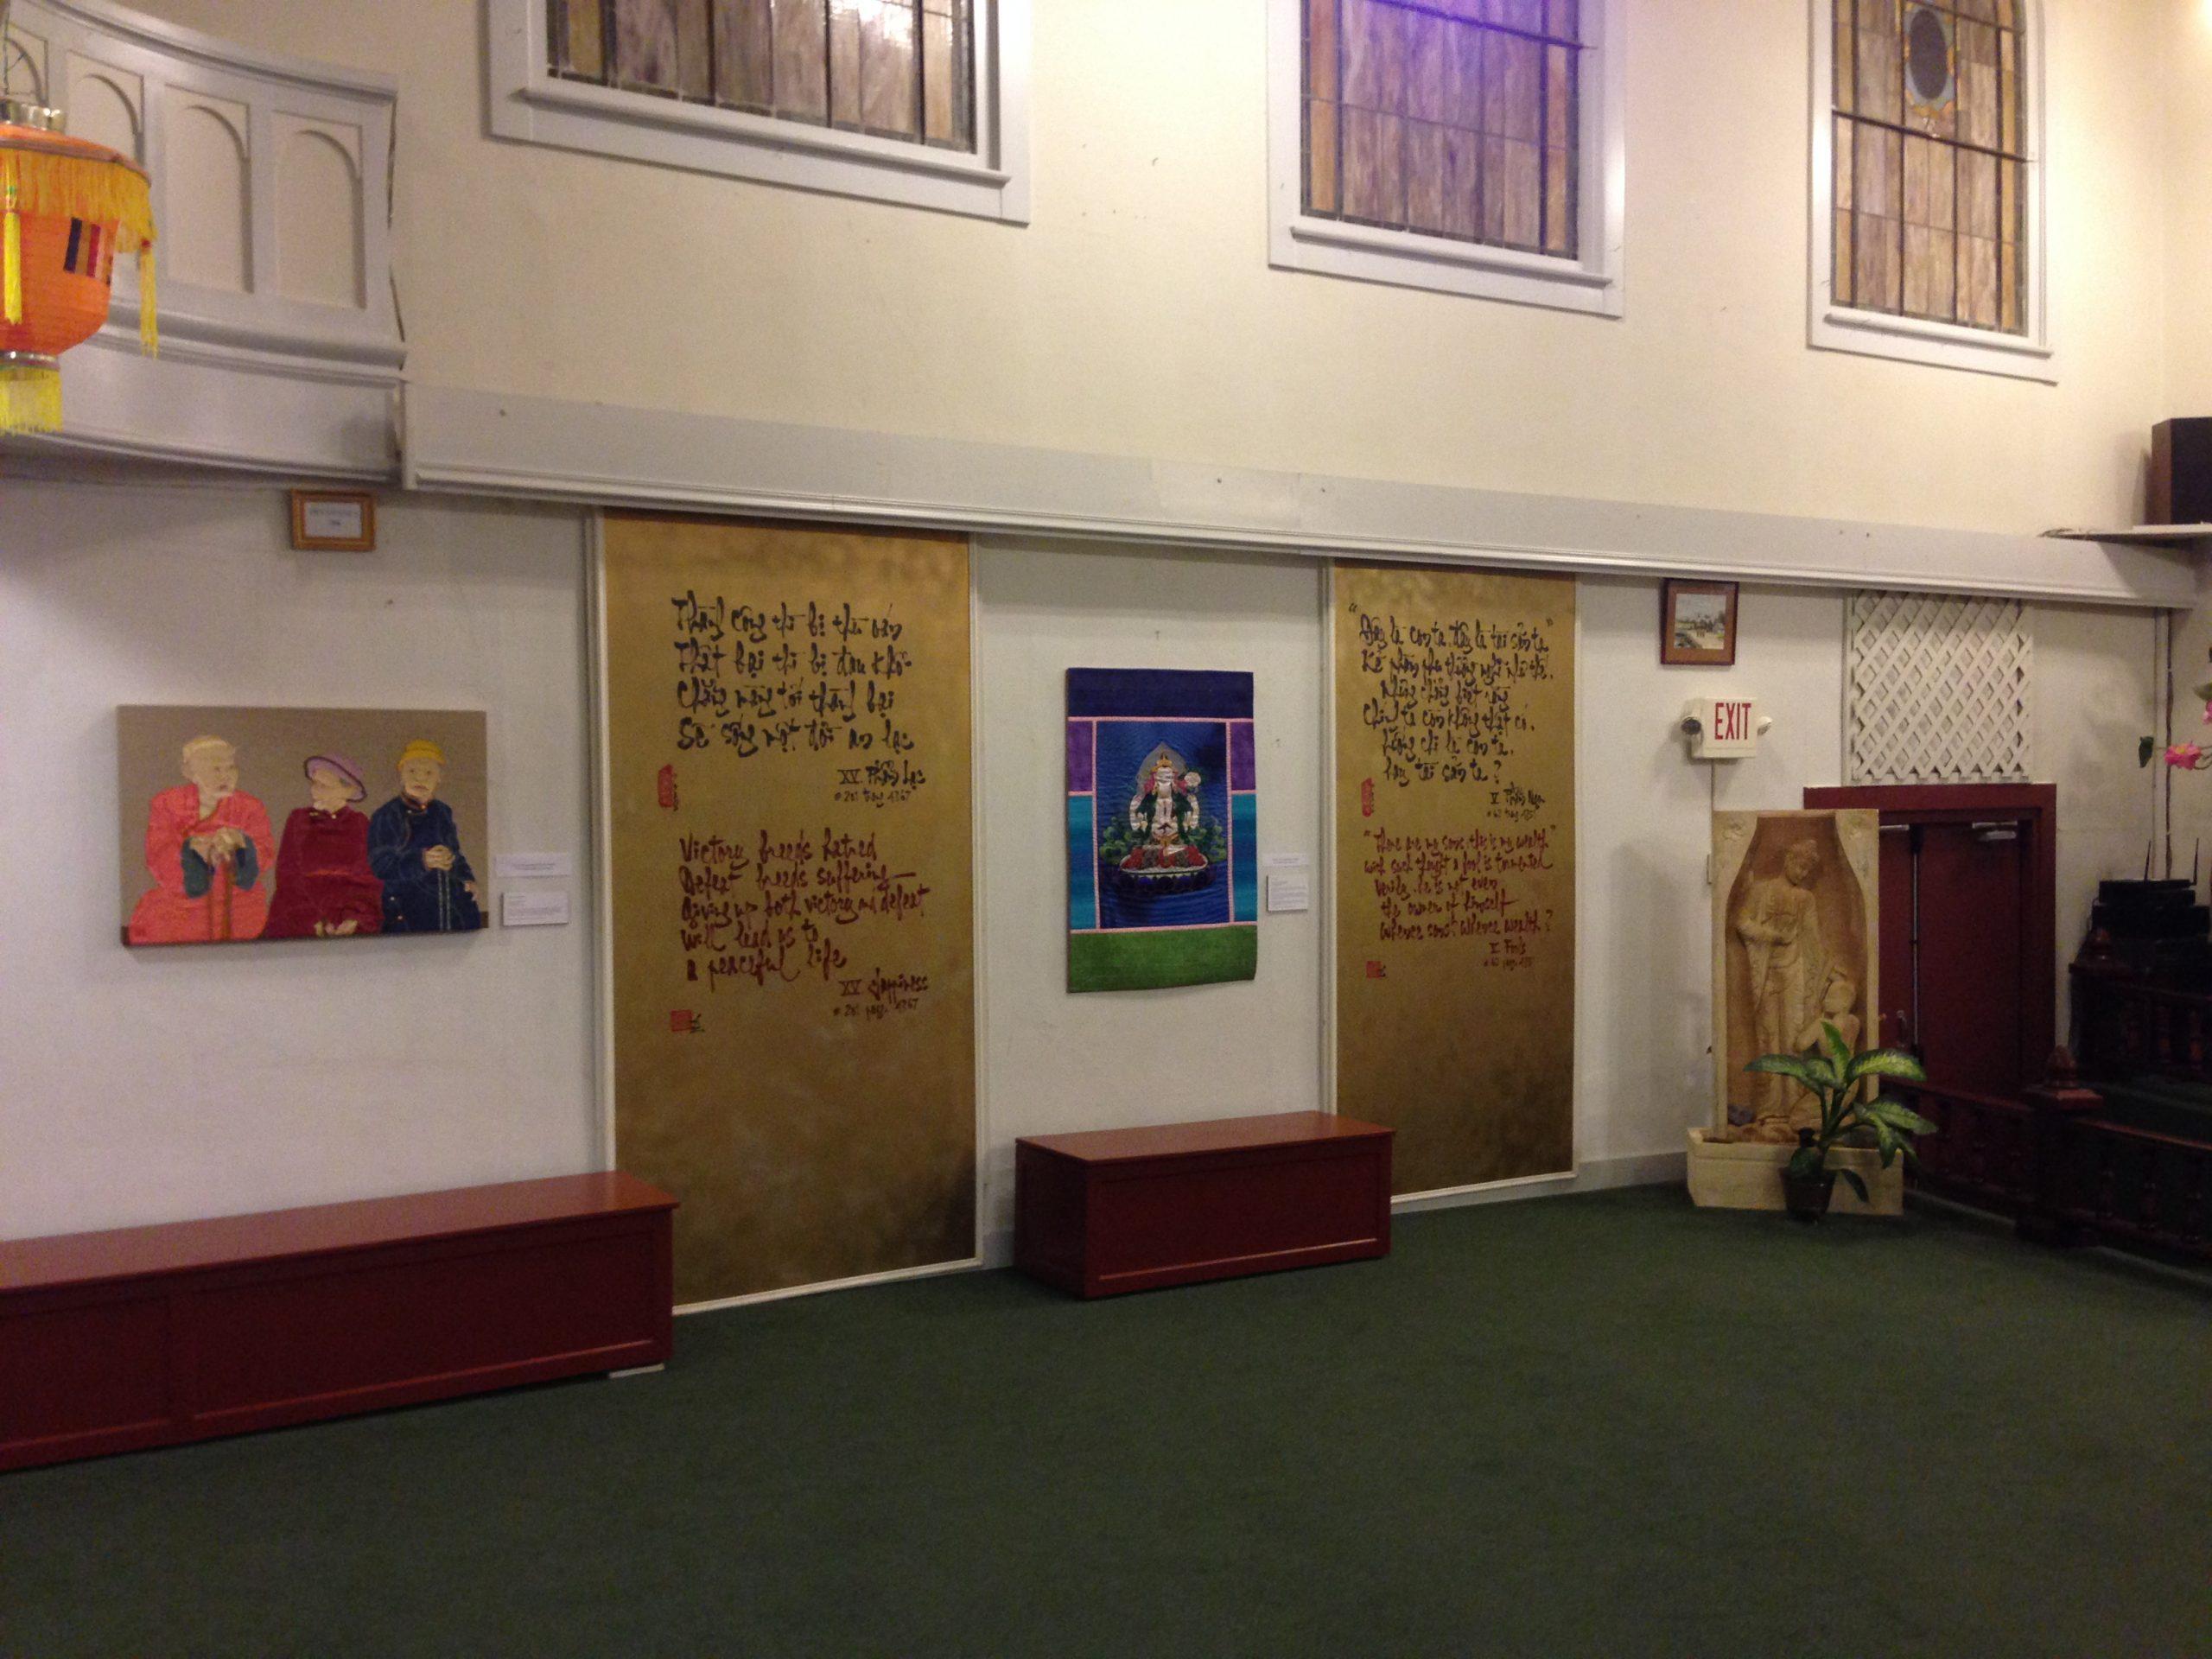 Eclectic Buddhism in Ventura